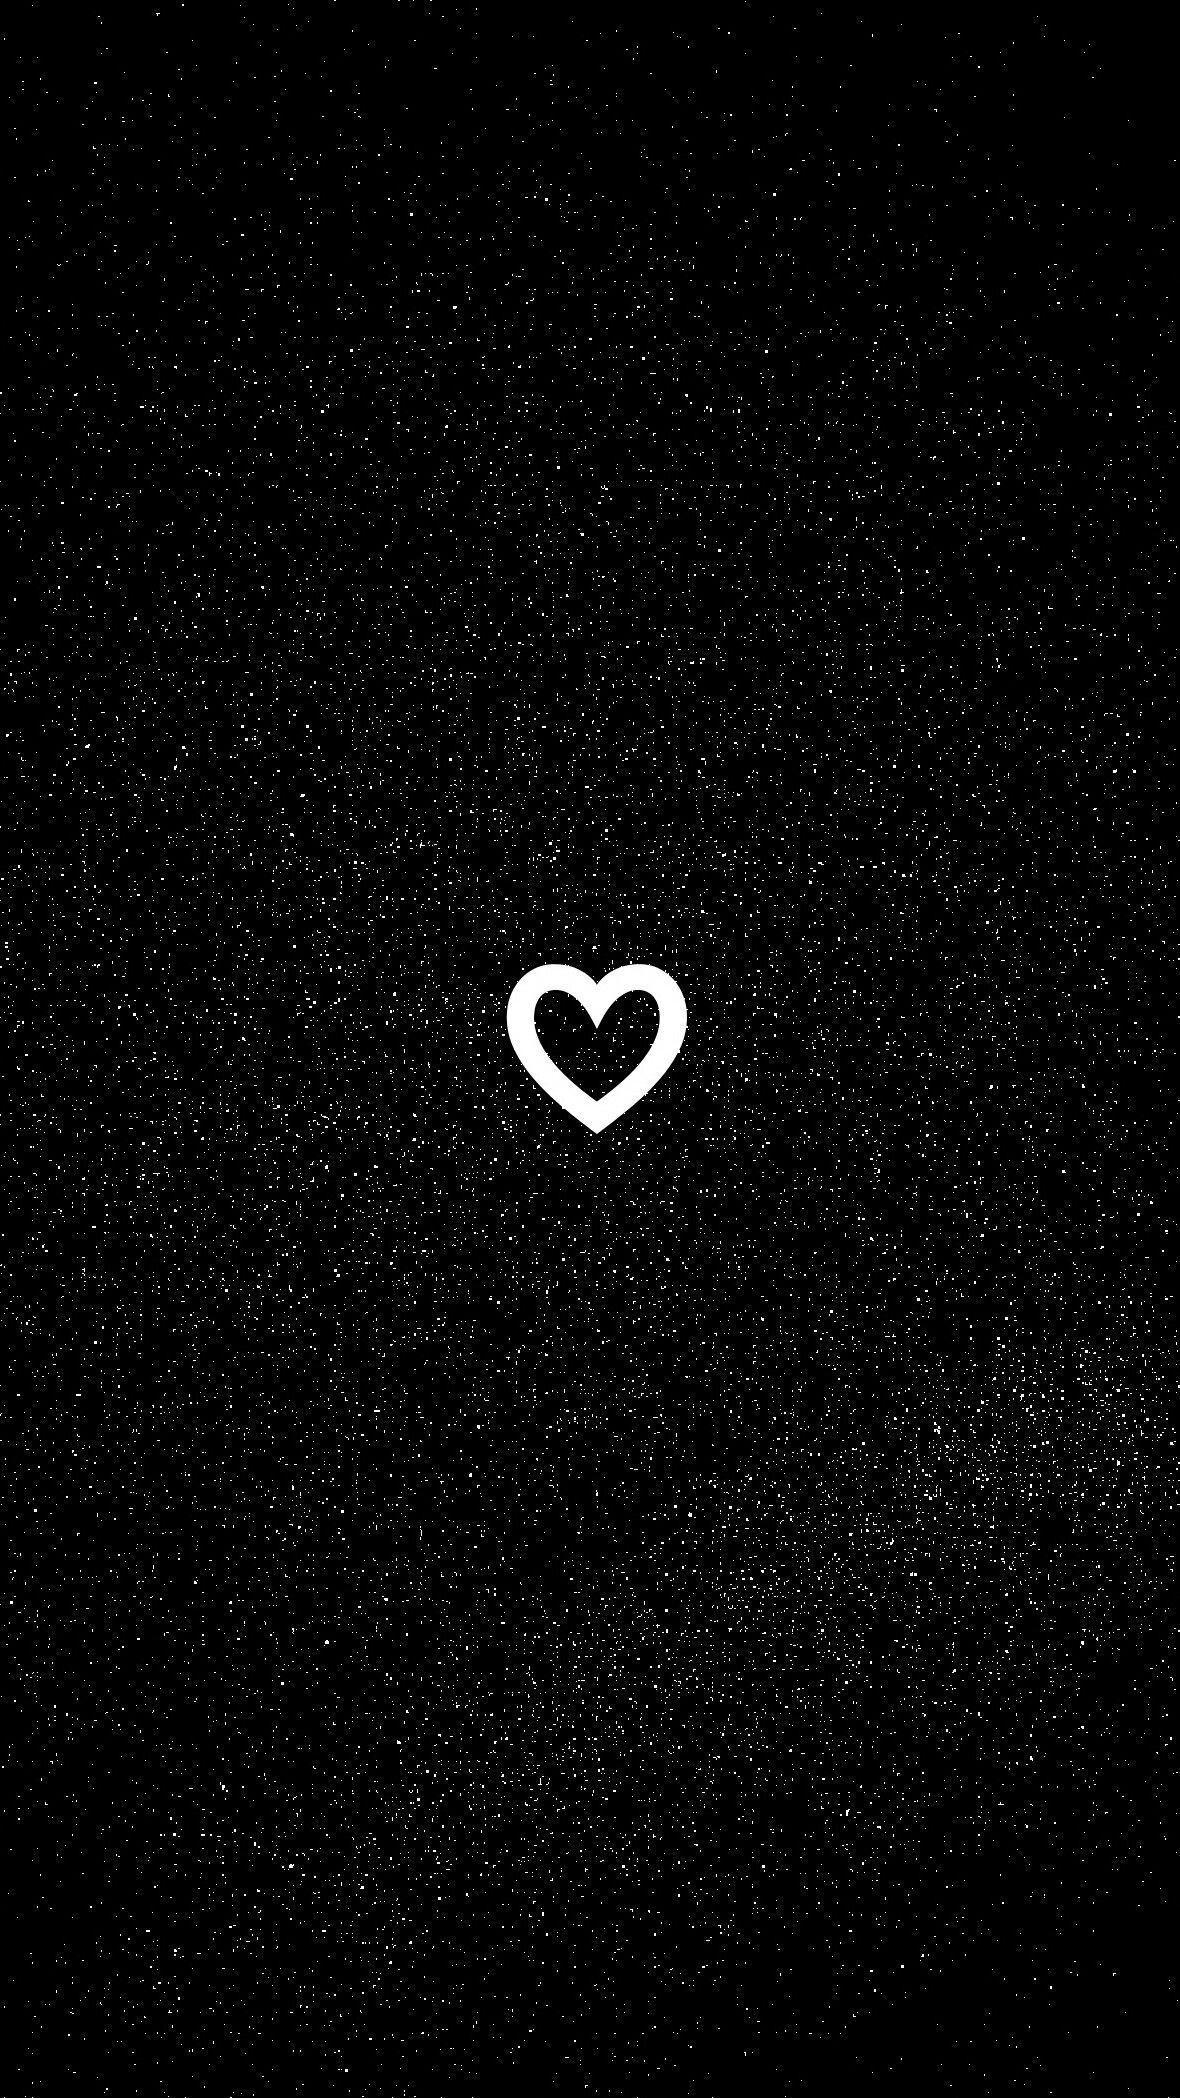 Black Heart Aesthetic Wallpapers - Top Free Black Heart ...